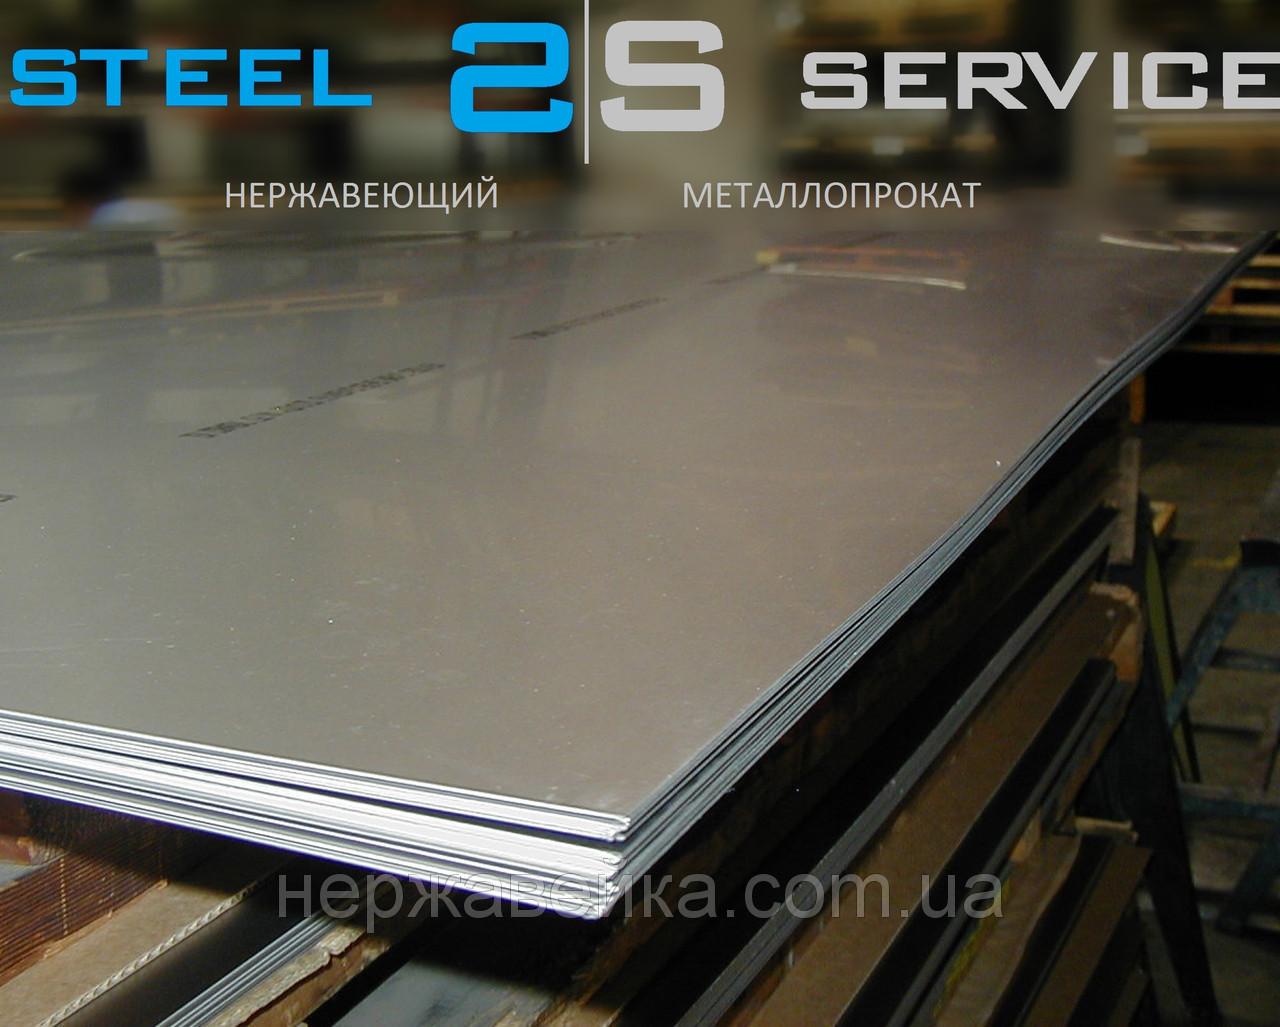 Нержавейка лист 8х1500х6000мм AISI 410S(08Х13) F1 - горячекатанный, технический